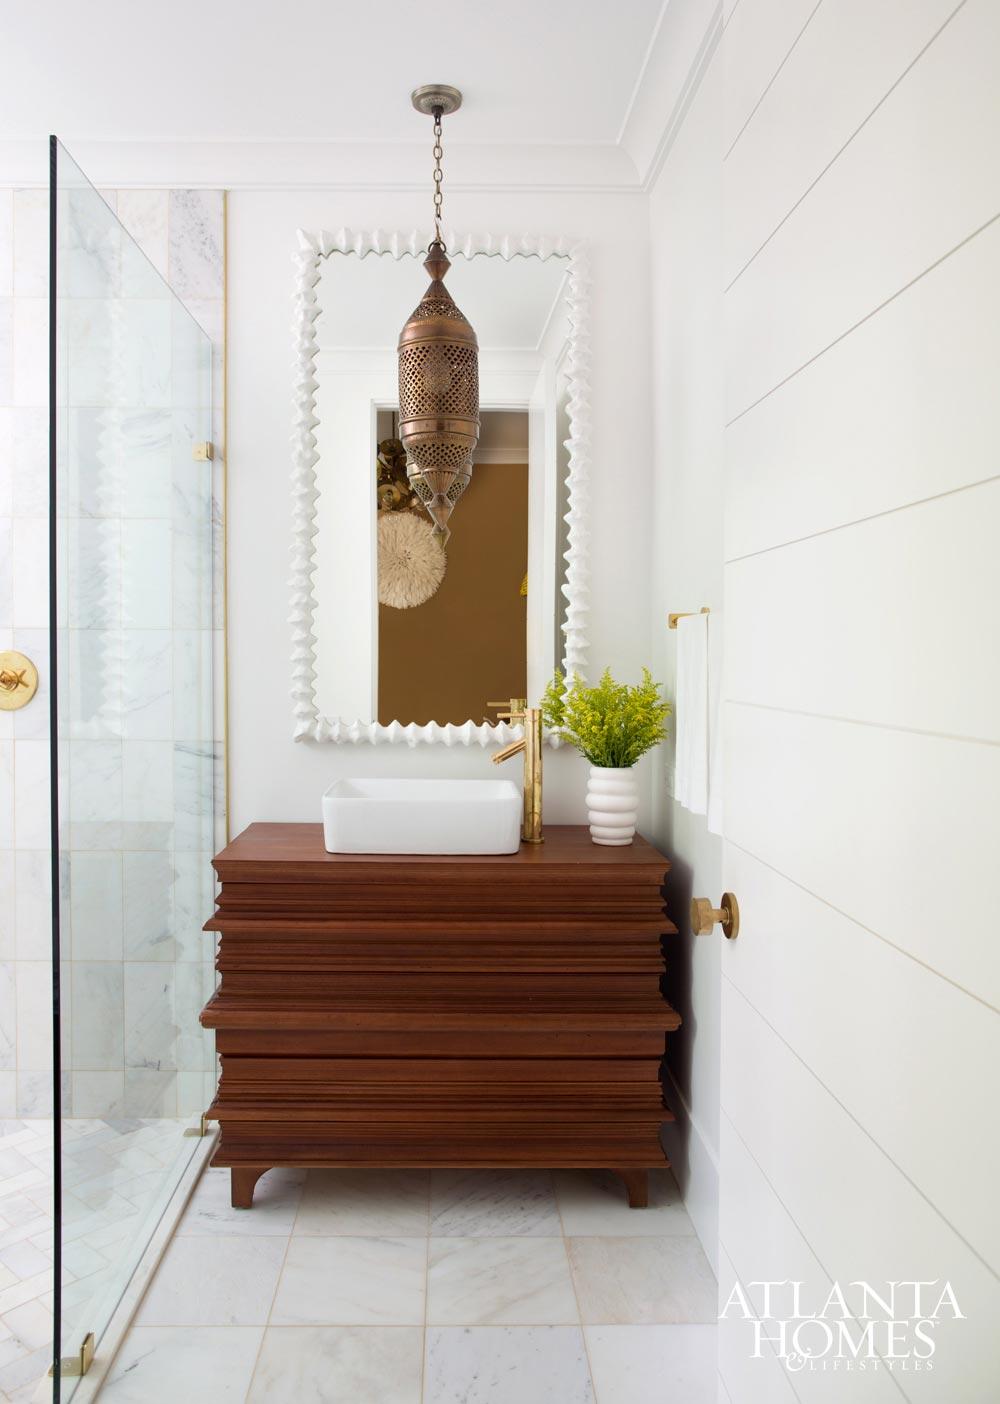 Modern eclectic bathroom in an Atlanta home via @thouswellblog